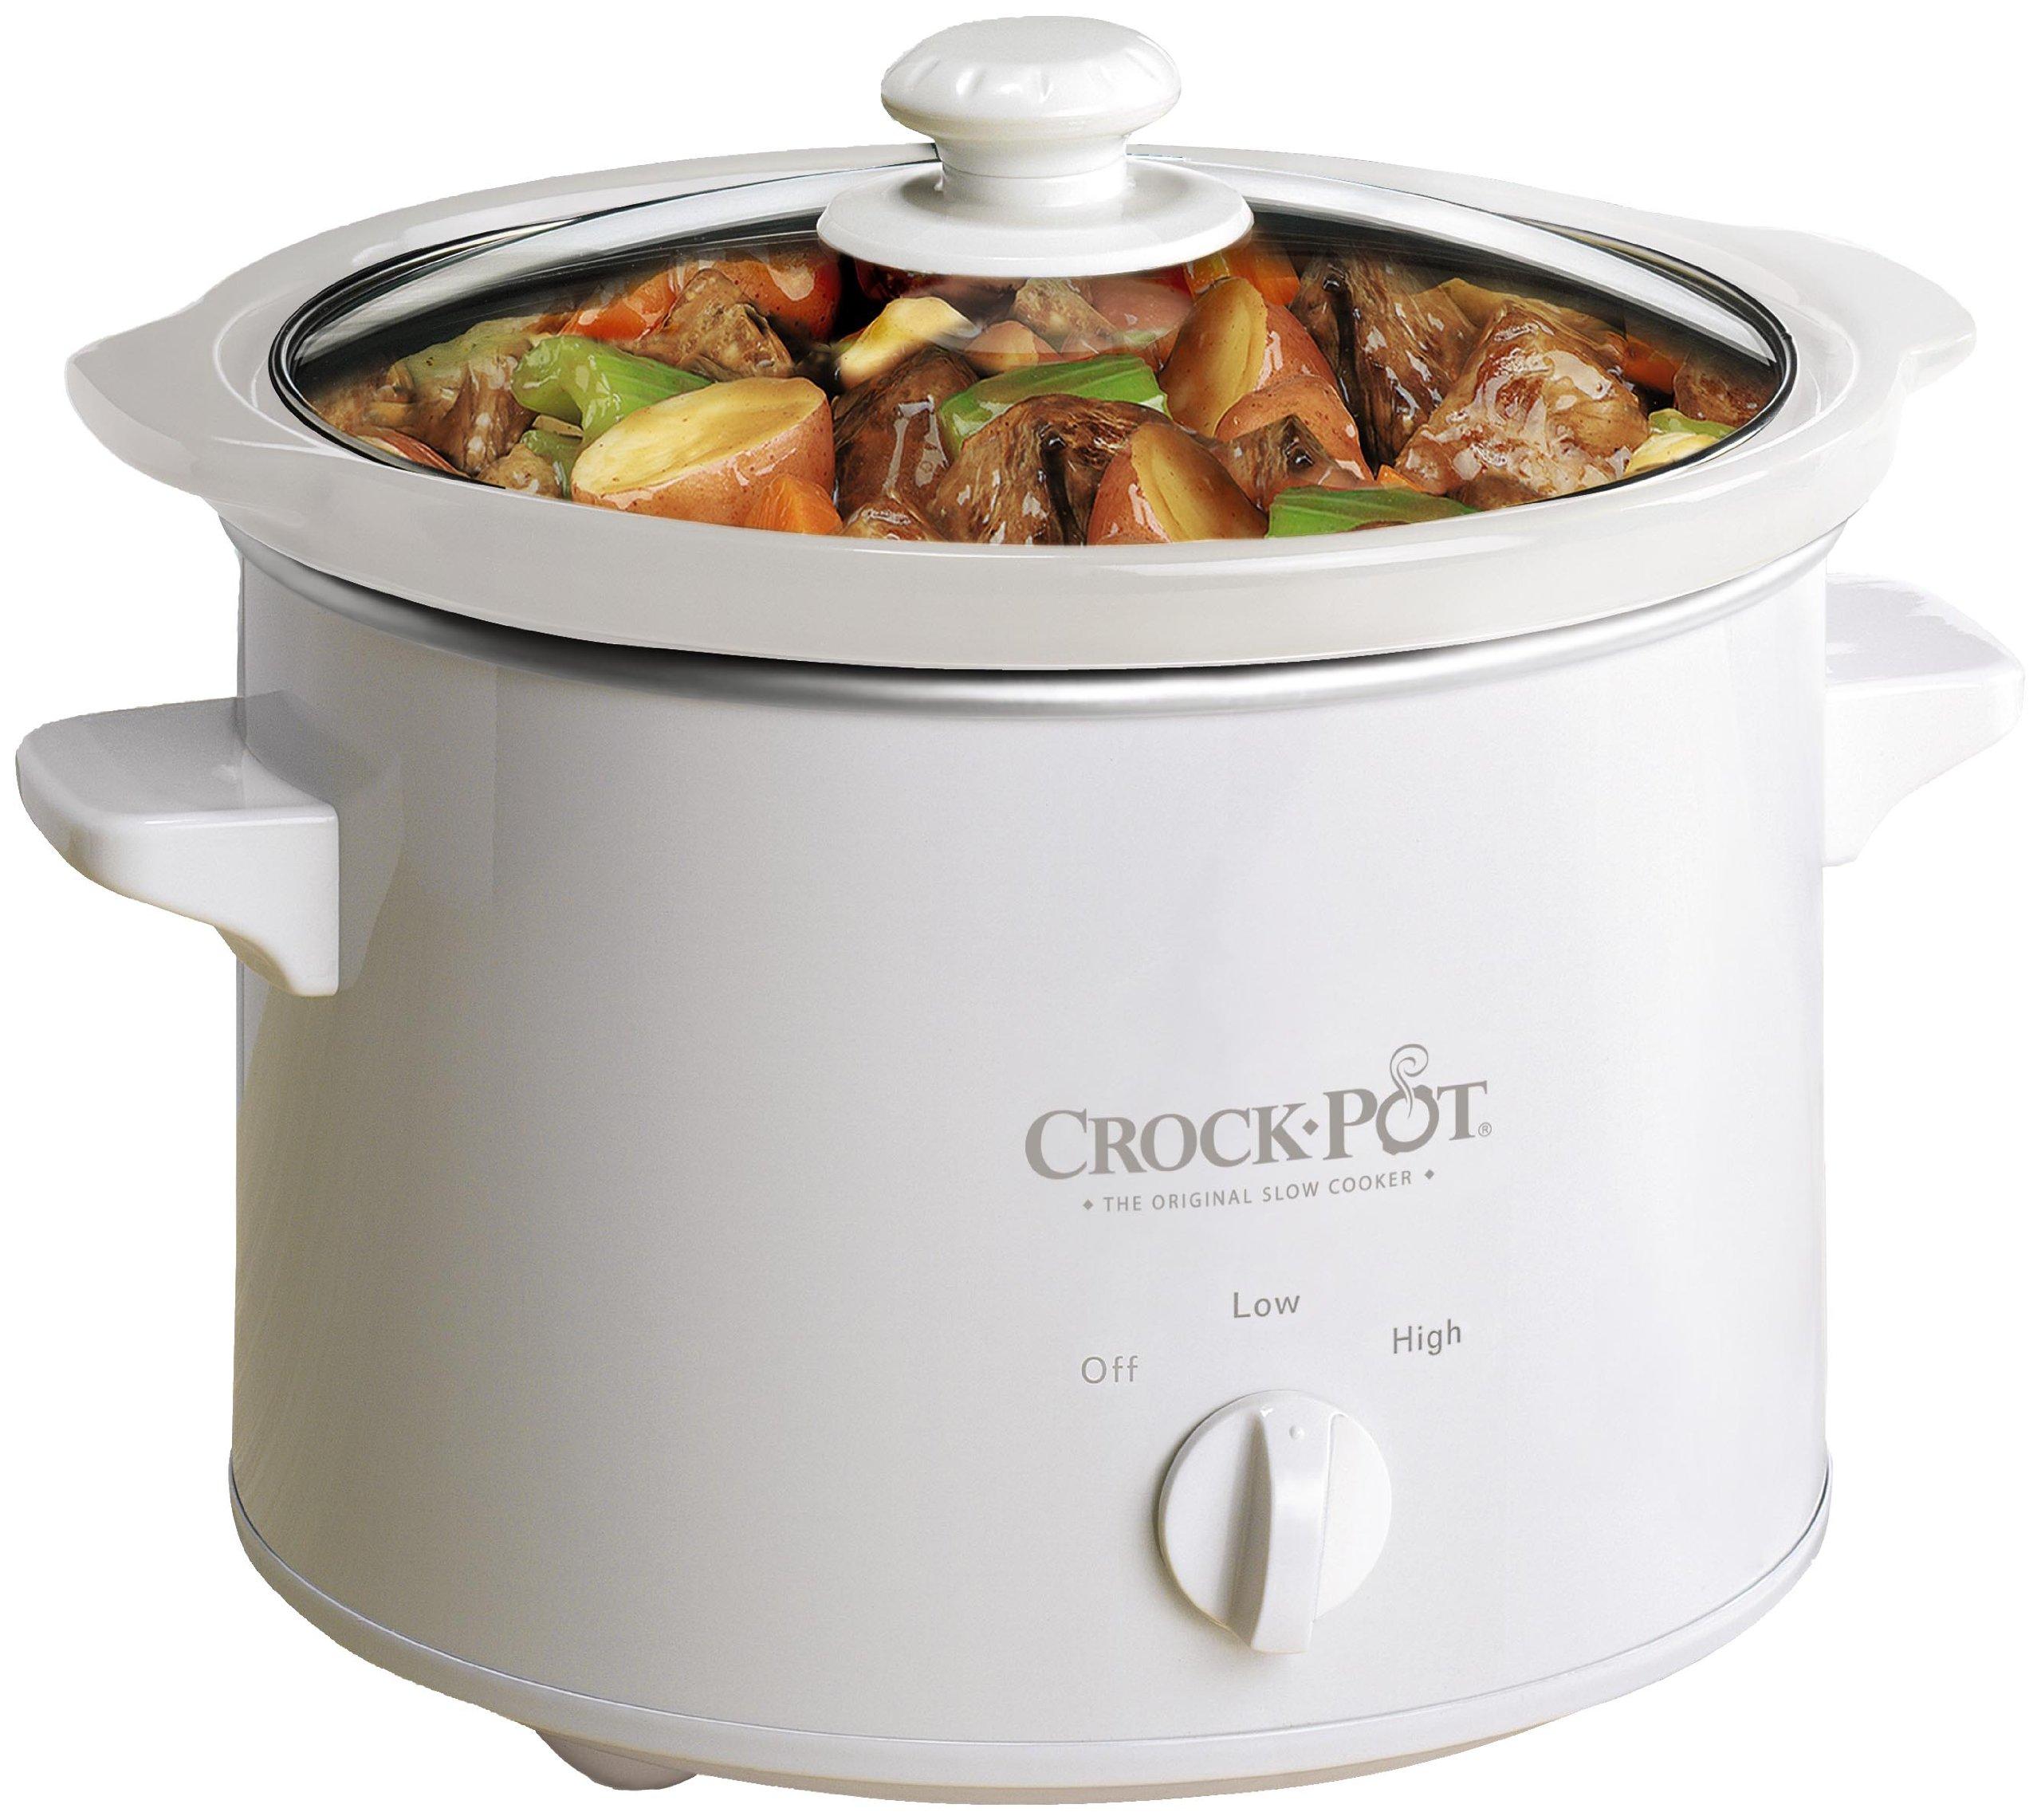 Crock-Pot 220 Volts (Not for USA) Slow Cooker, 2.4 Litre, White